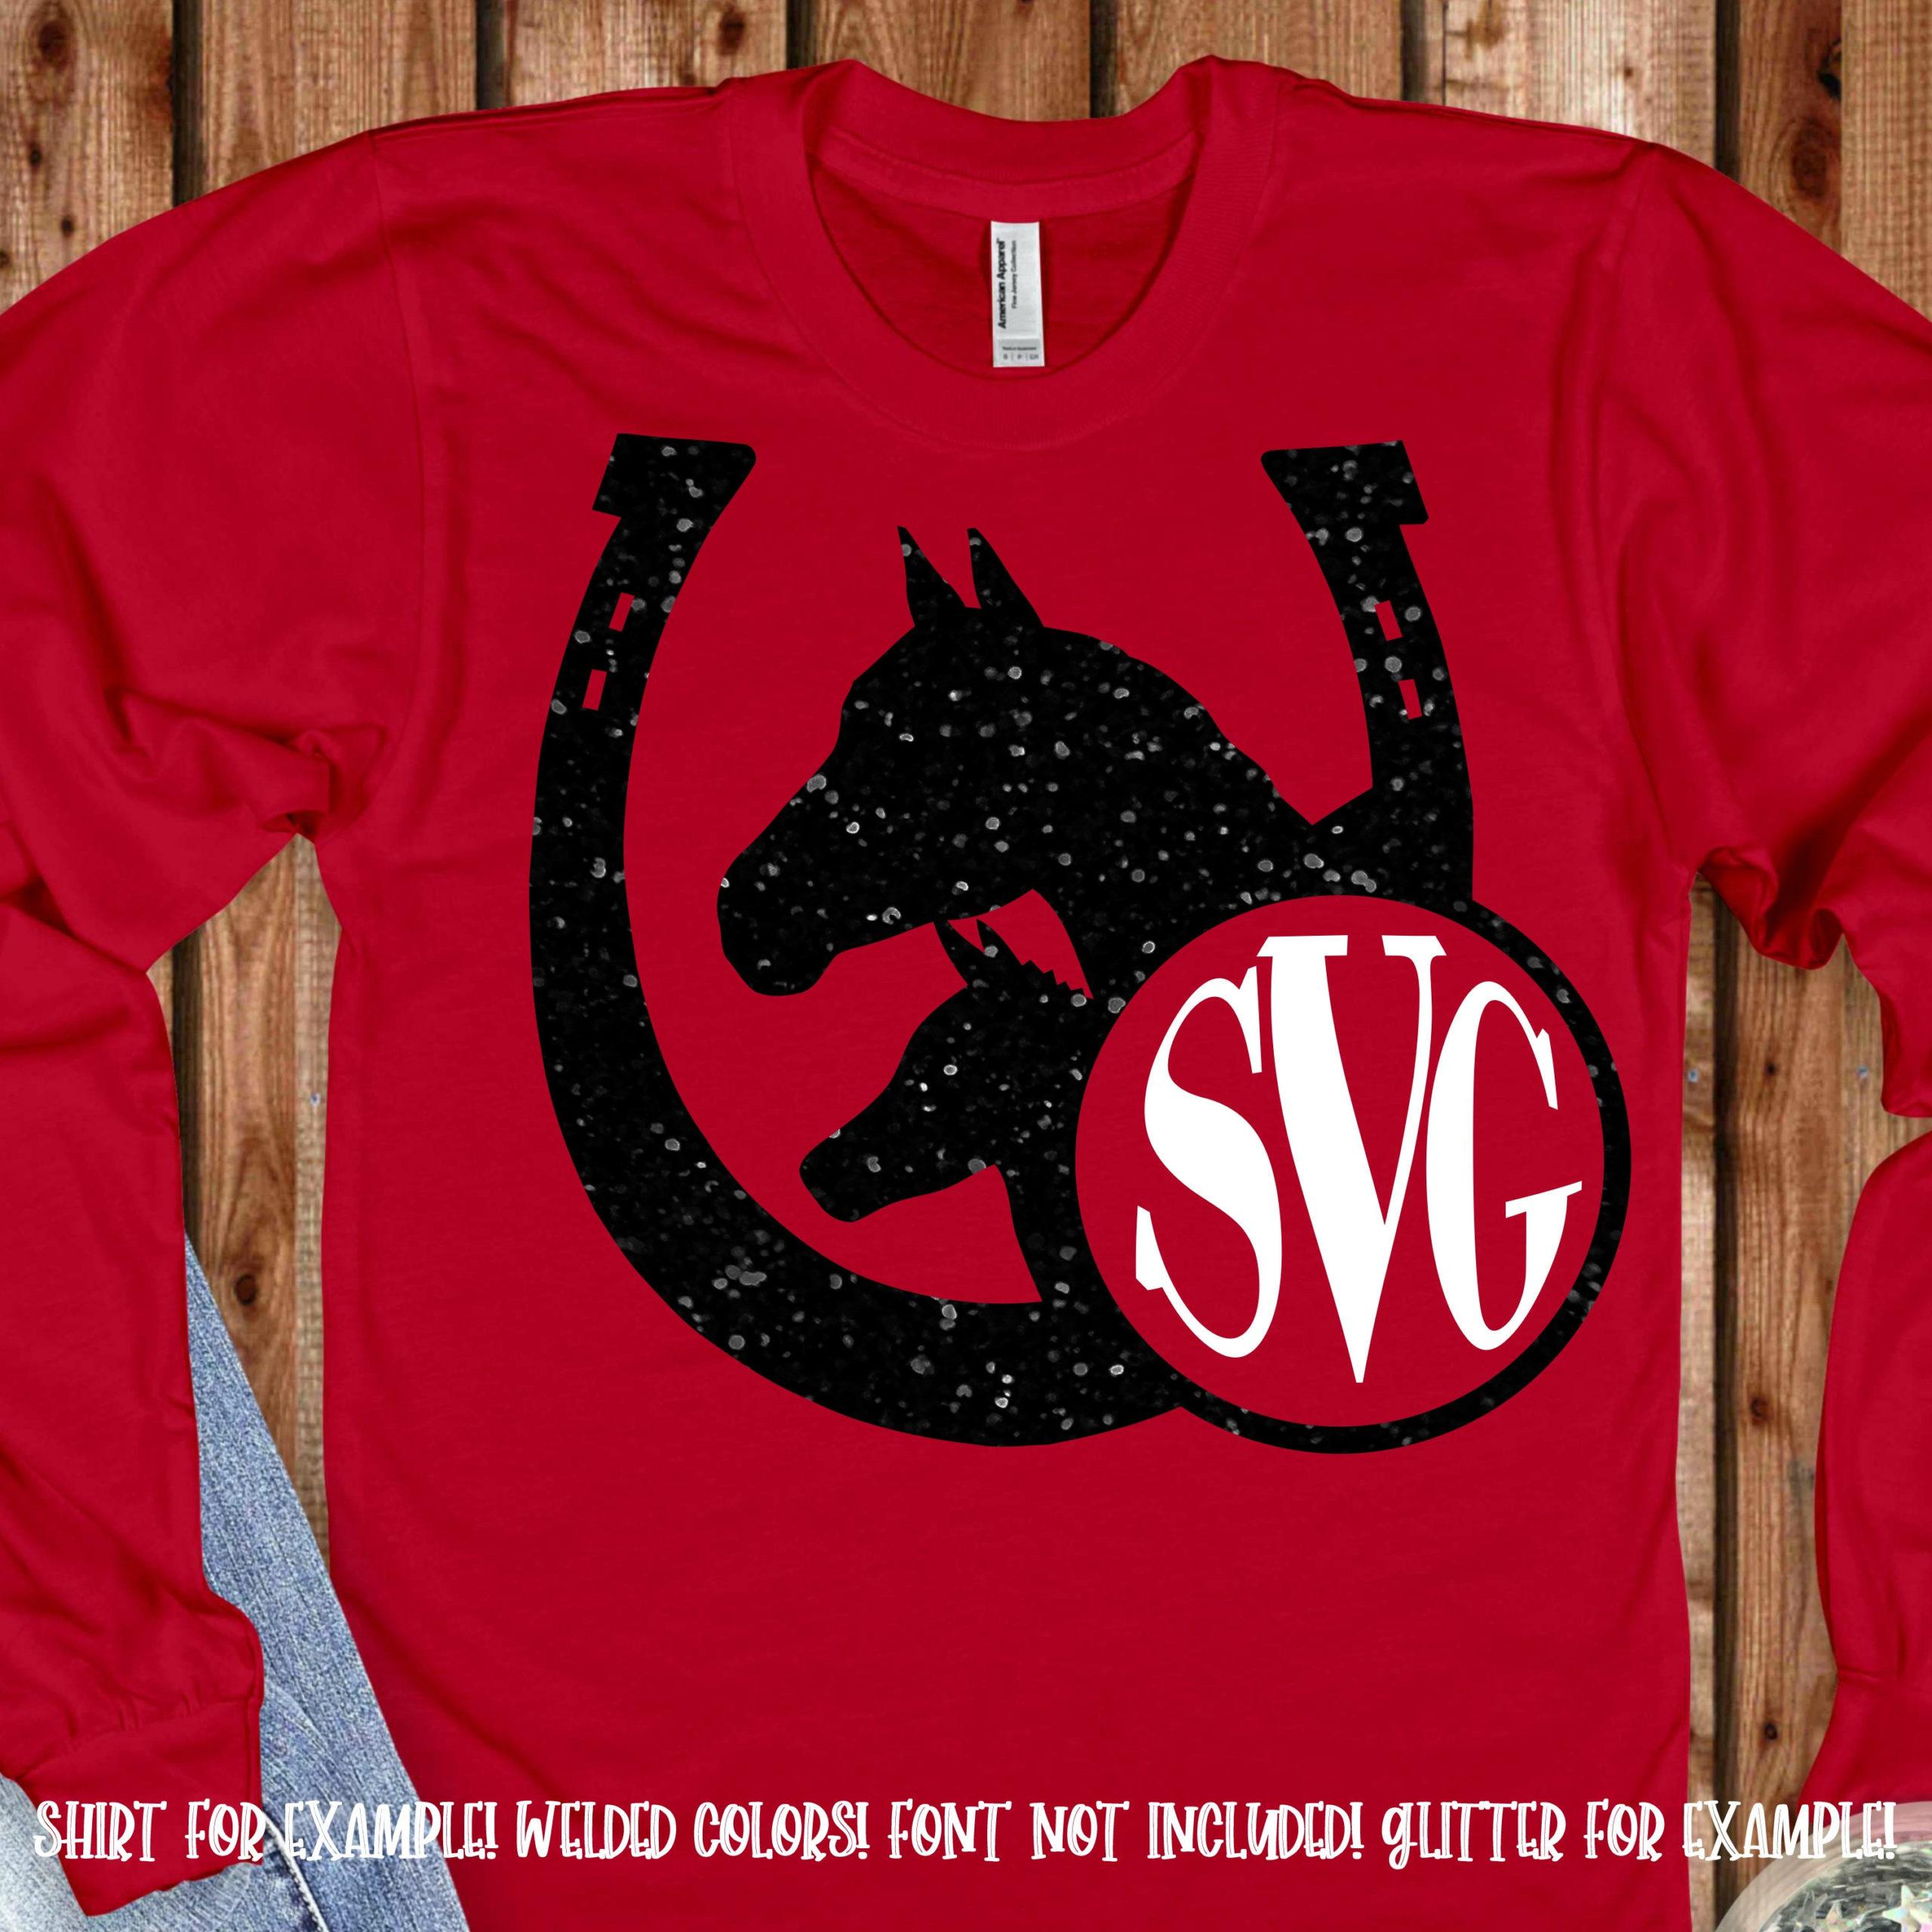 Horse-shoe-svg-horse-monogram-svg-monogram-svg-monogram-horse-svg-tshirt-cuttable-svg-designs-cuttable-cut-file-cricut-svg-605130c3